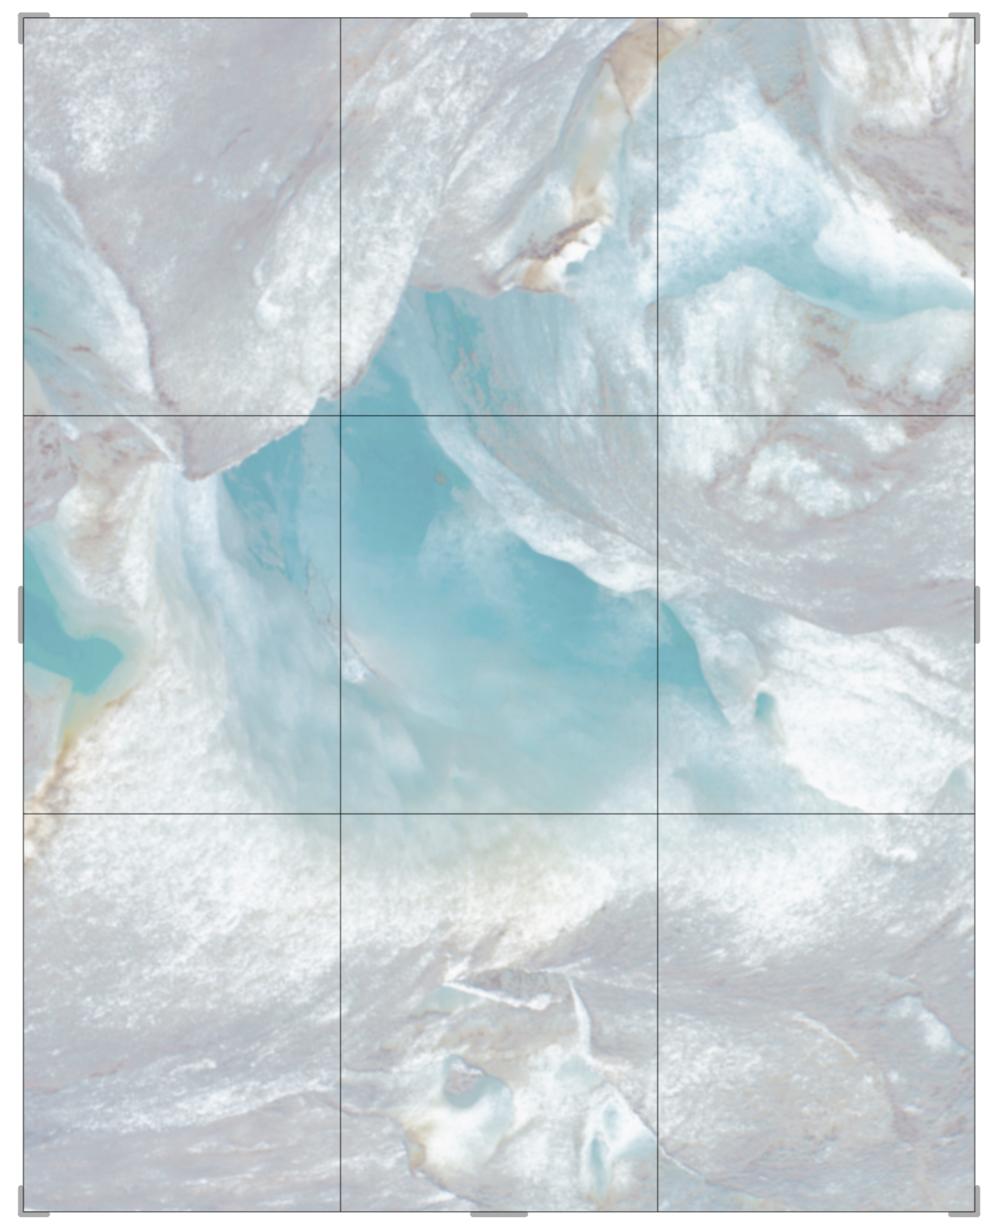 Piqaluyak / Part III,  2019 Aquarelle, wax pastels, UV-print on paper beneath structured Plexiglas 230 x 200 cm (91 x 79 in)